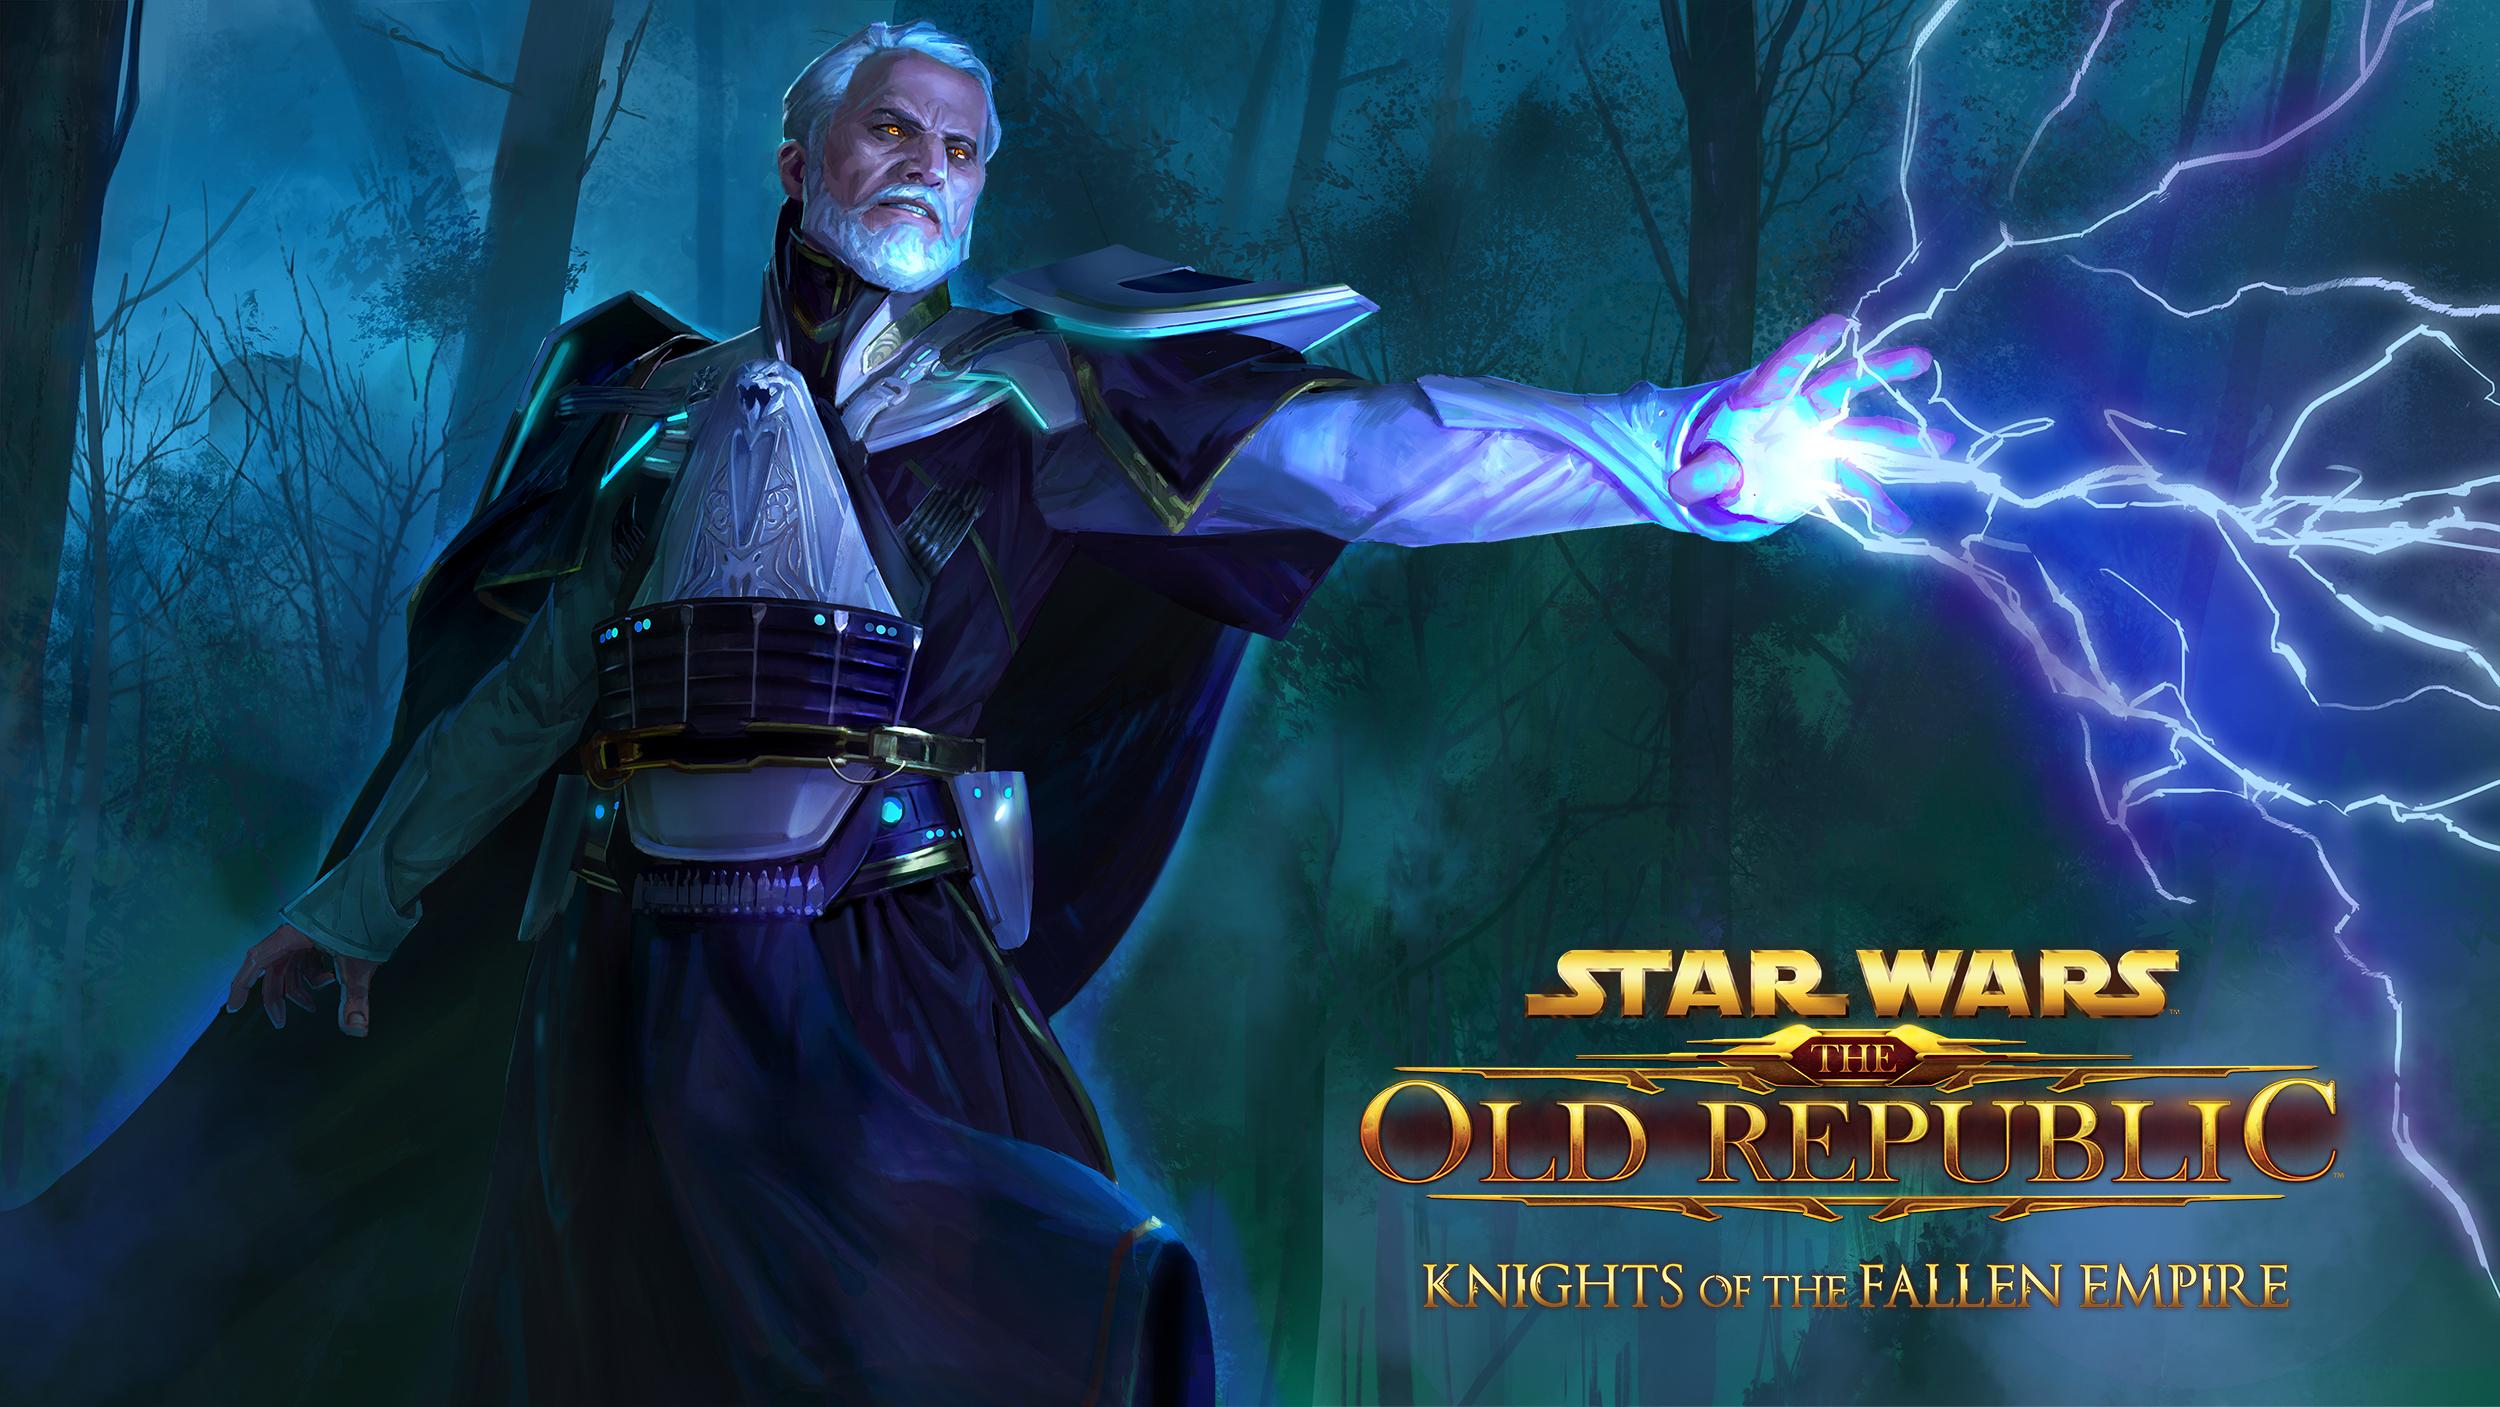 Bioware Announces Visions In The Dark For The Old Republic